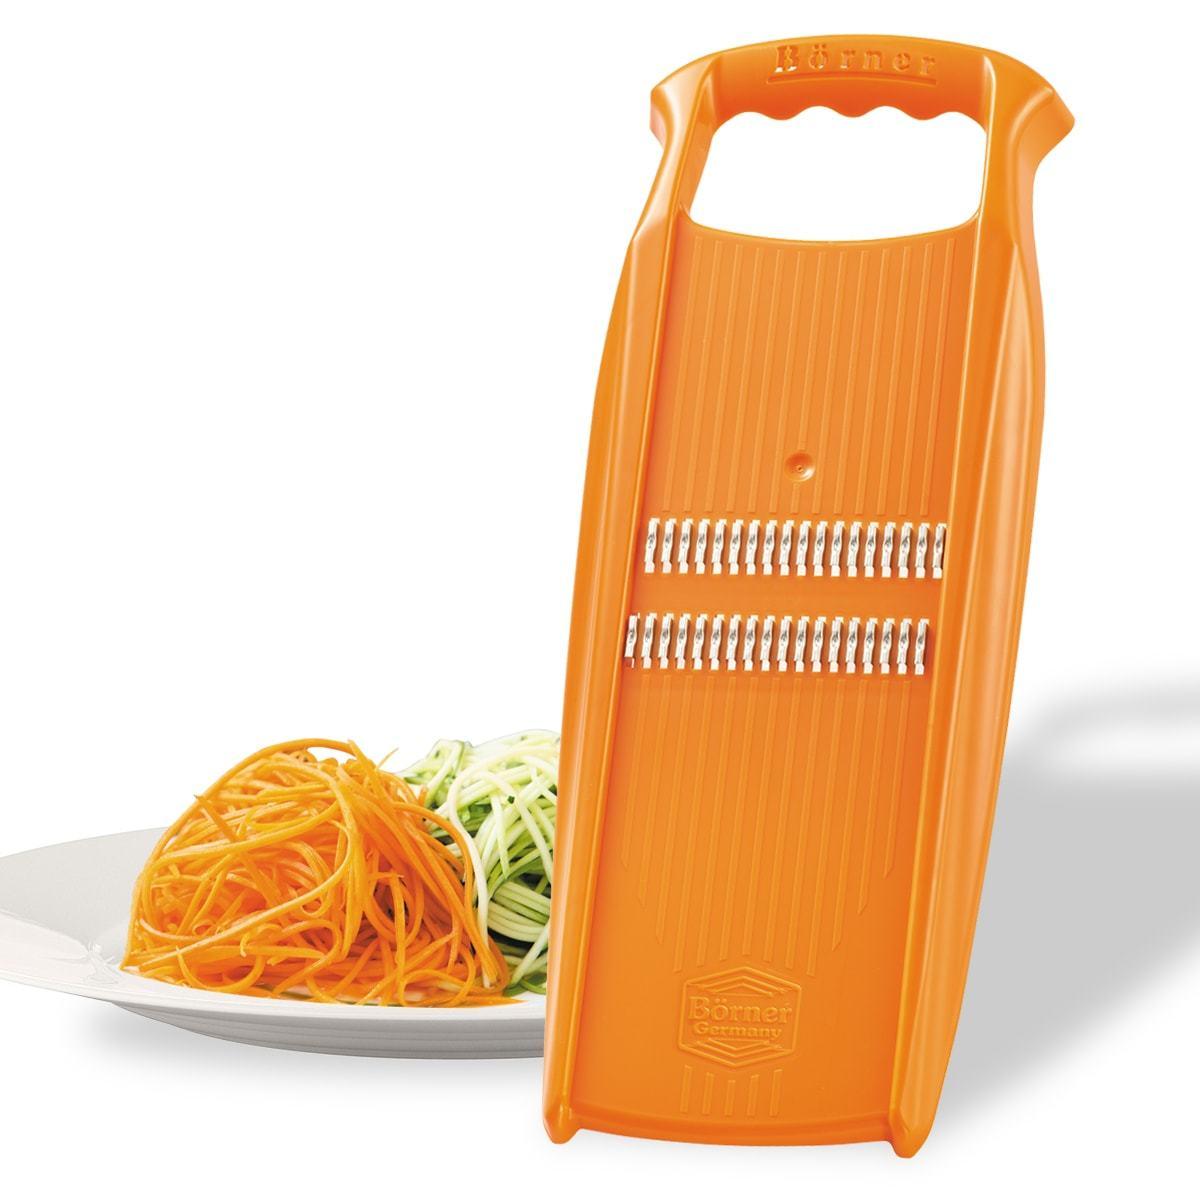 Терка Borner для корейской моркови оранжевая